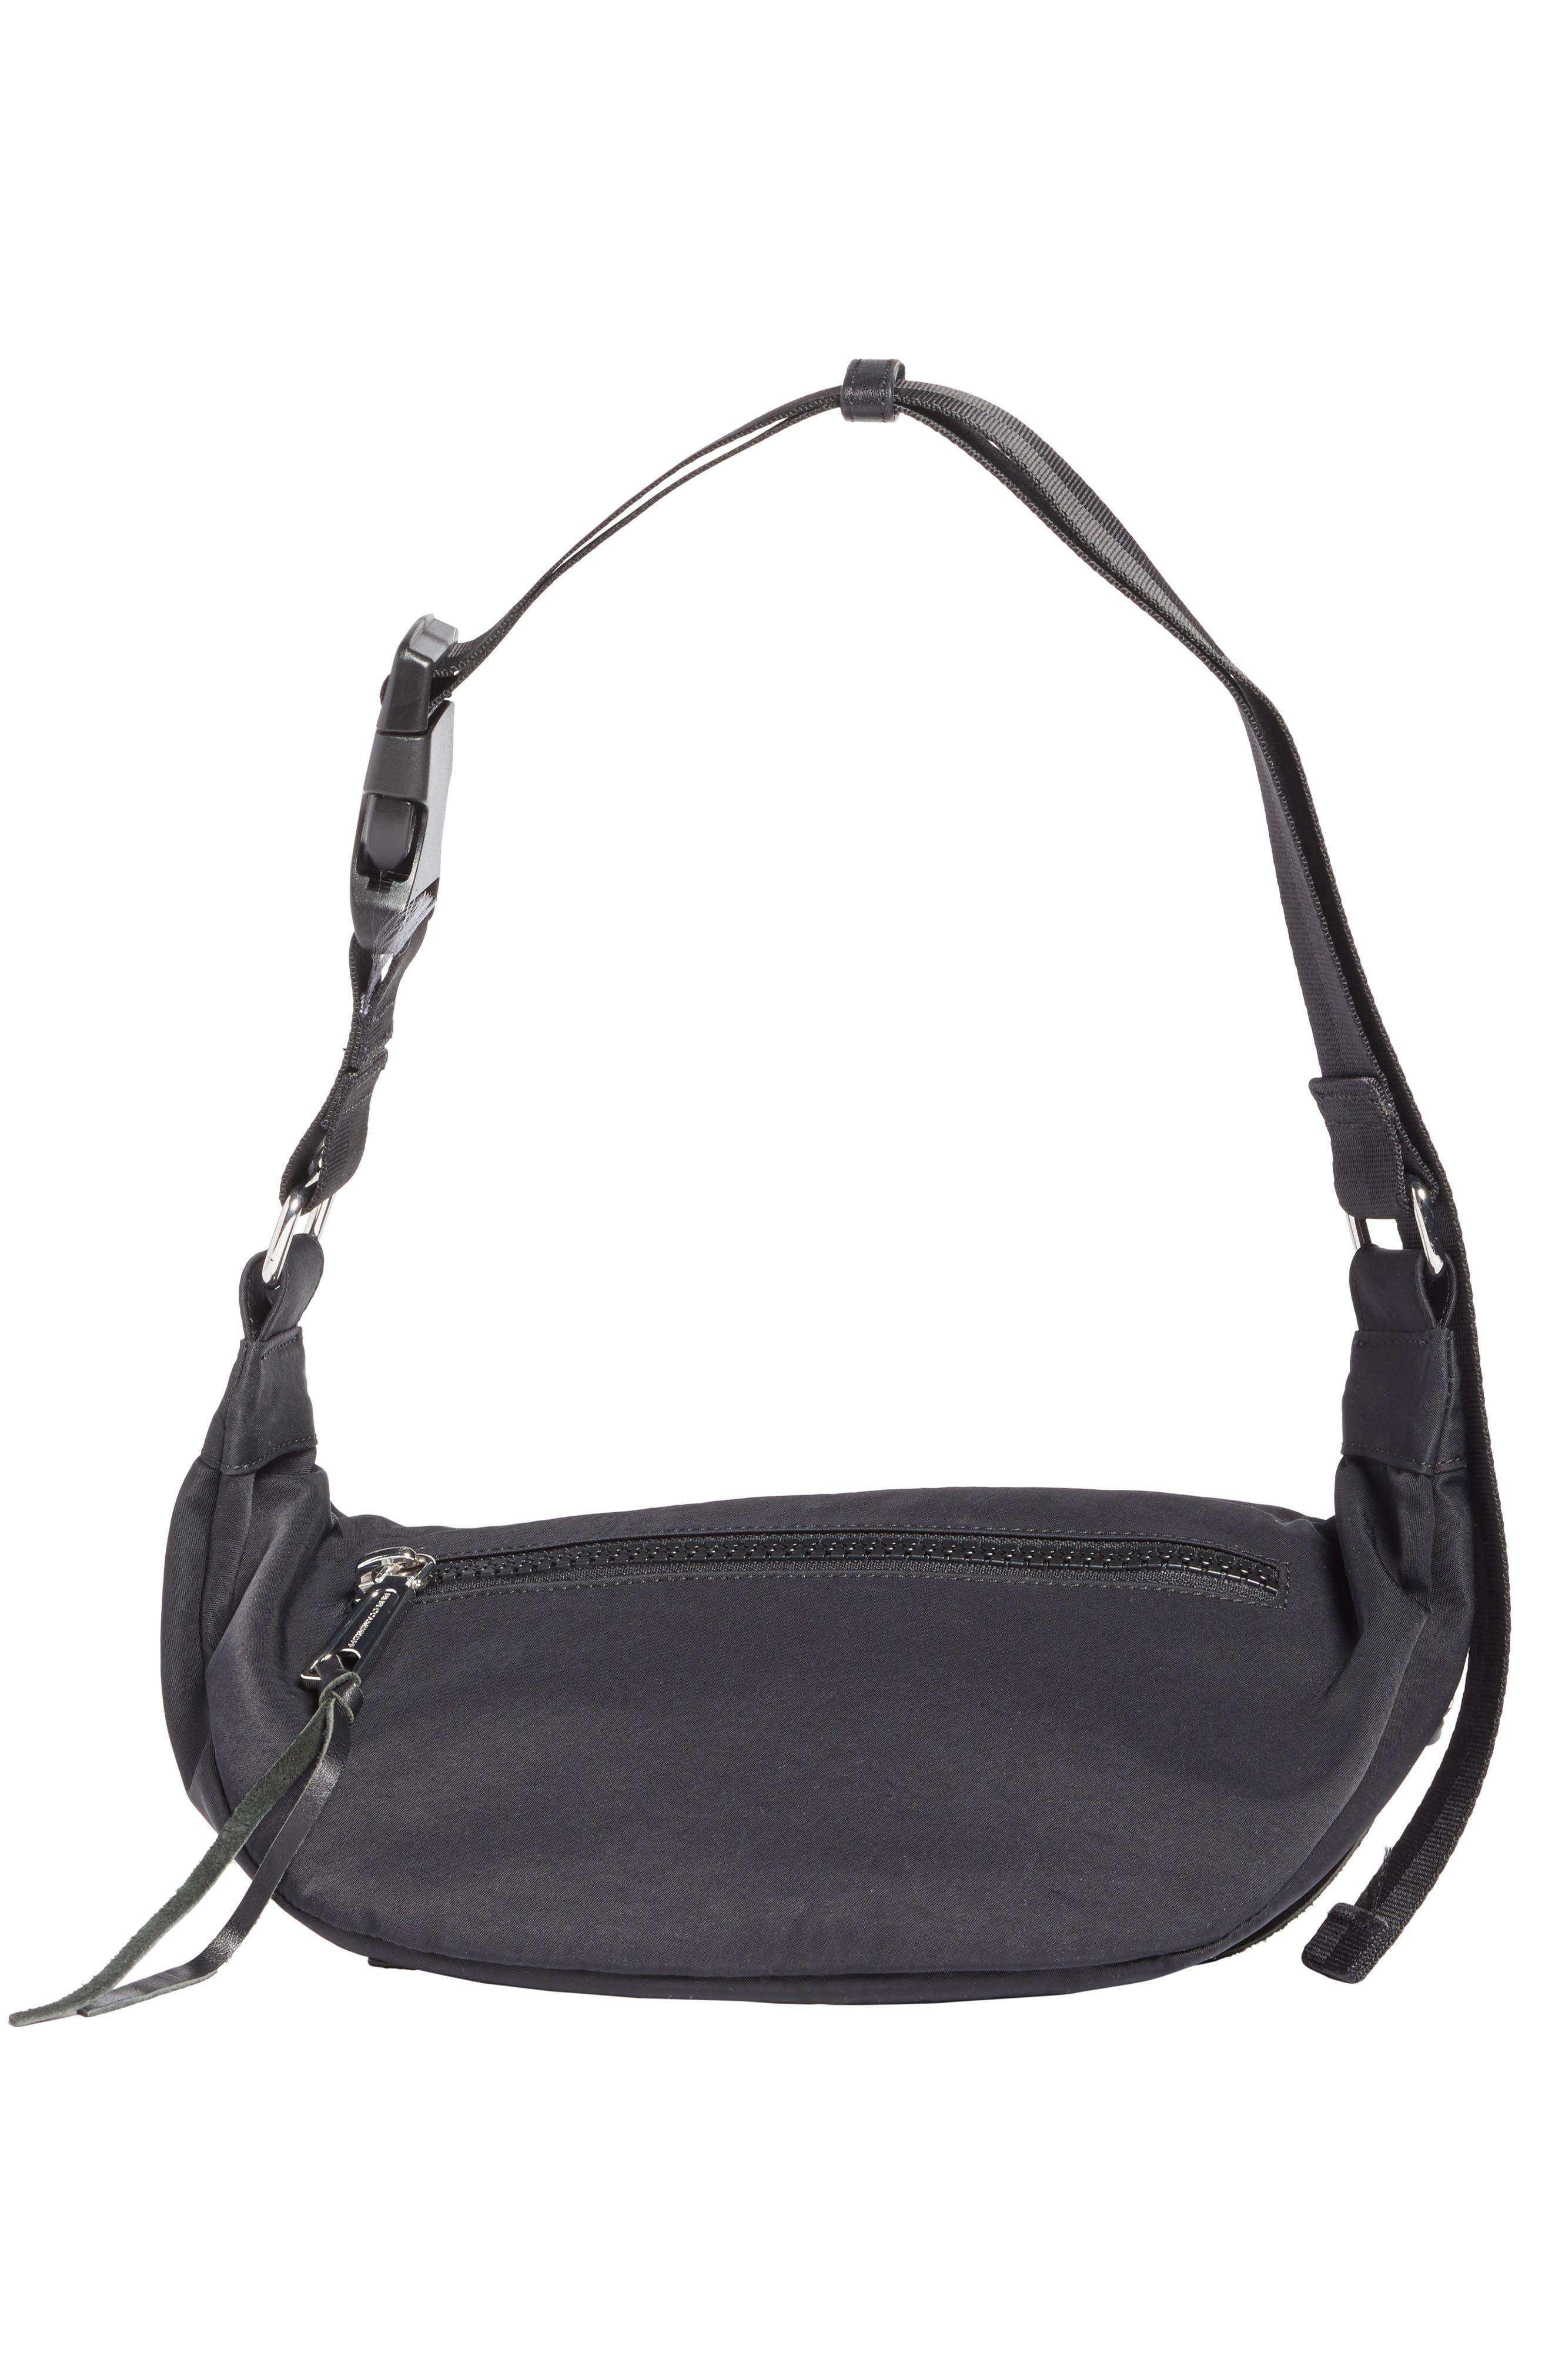 REBECCA MINKOFF, Nylon Belt Bag, Alternate thumbnail 7, color, BLACK